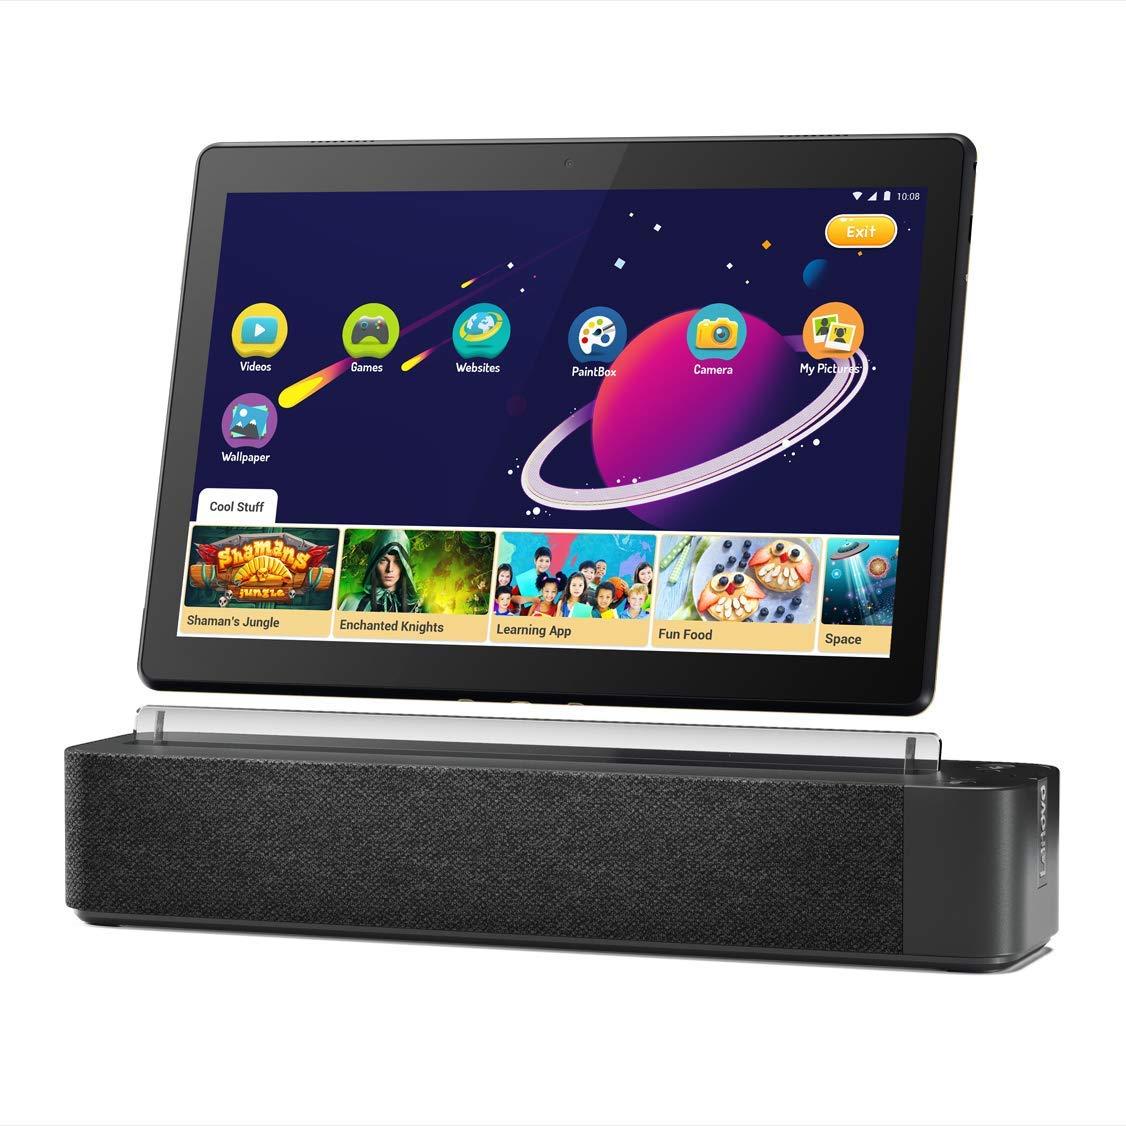 "Lenovo Smart Tab M10 HD 10.1"" Android Tablet 16GB [M10 HD] w/ Dock (1920 x 1200) $99"